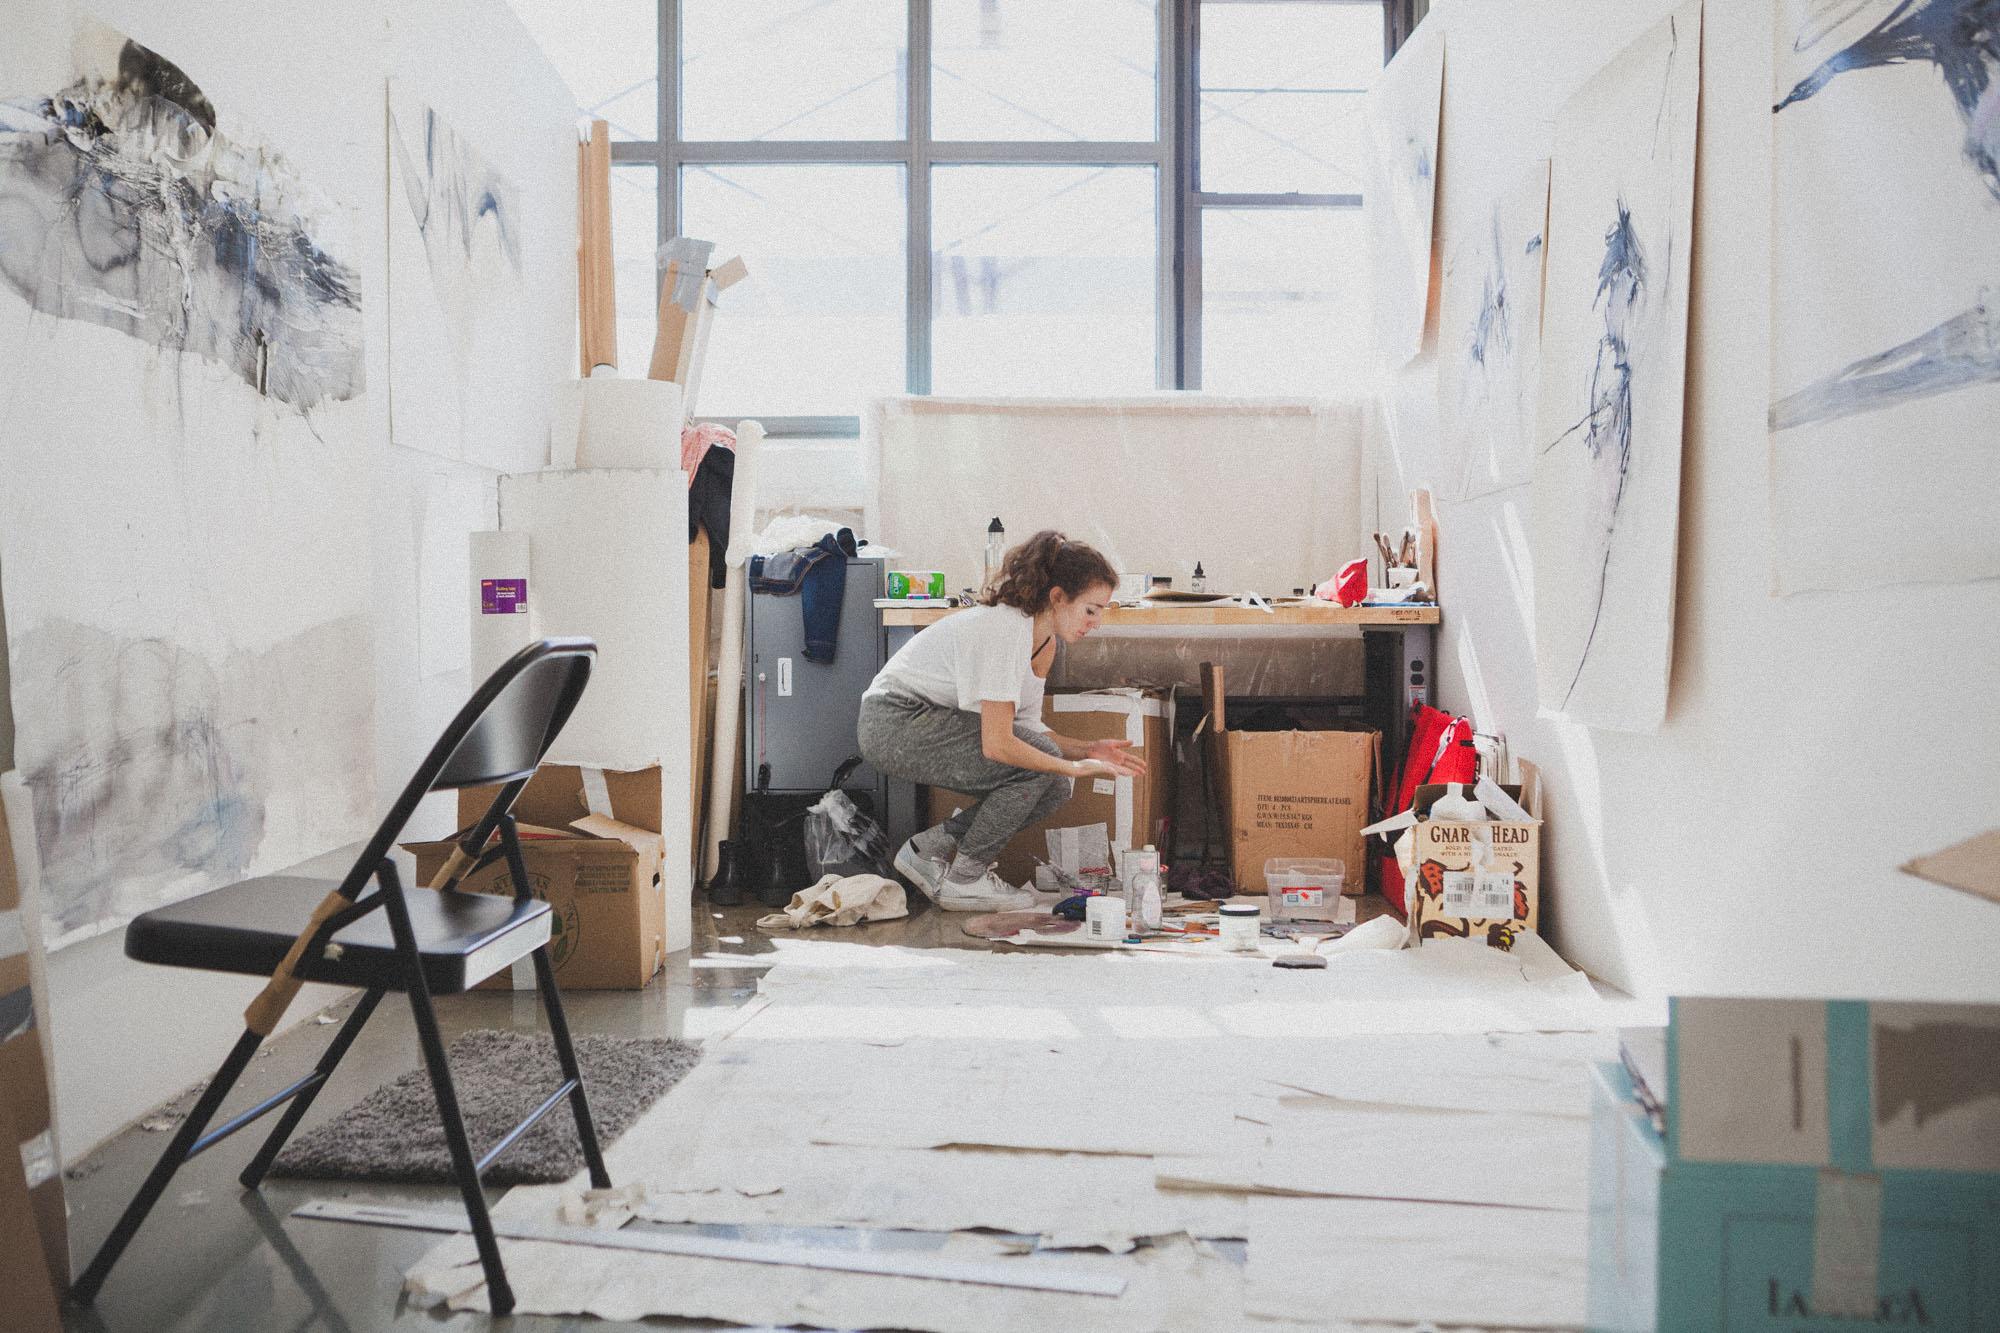 On Saturday, November 12 Pratt Institute Will Host Its Annual Open Studios  In The New Pfizer Building Location Of Its M.f.a. Program In Fine Arts, ...